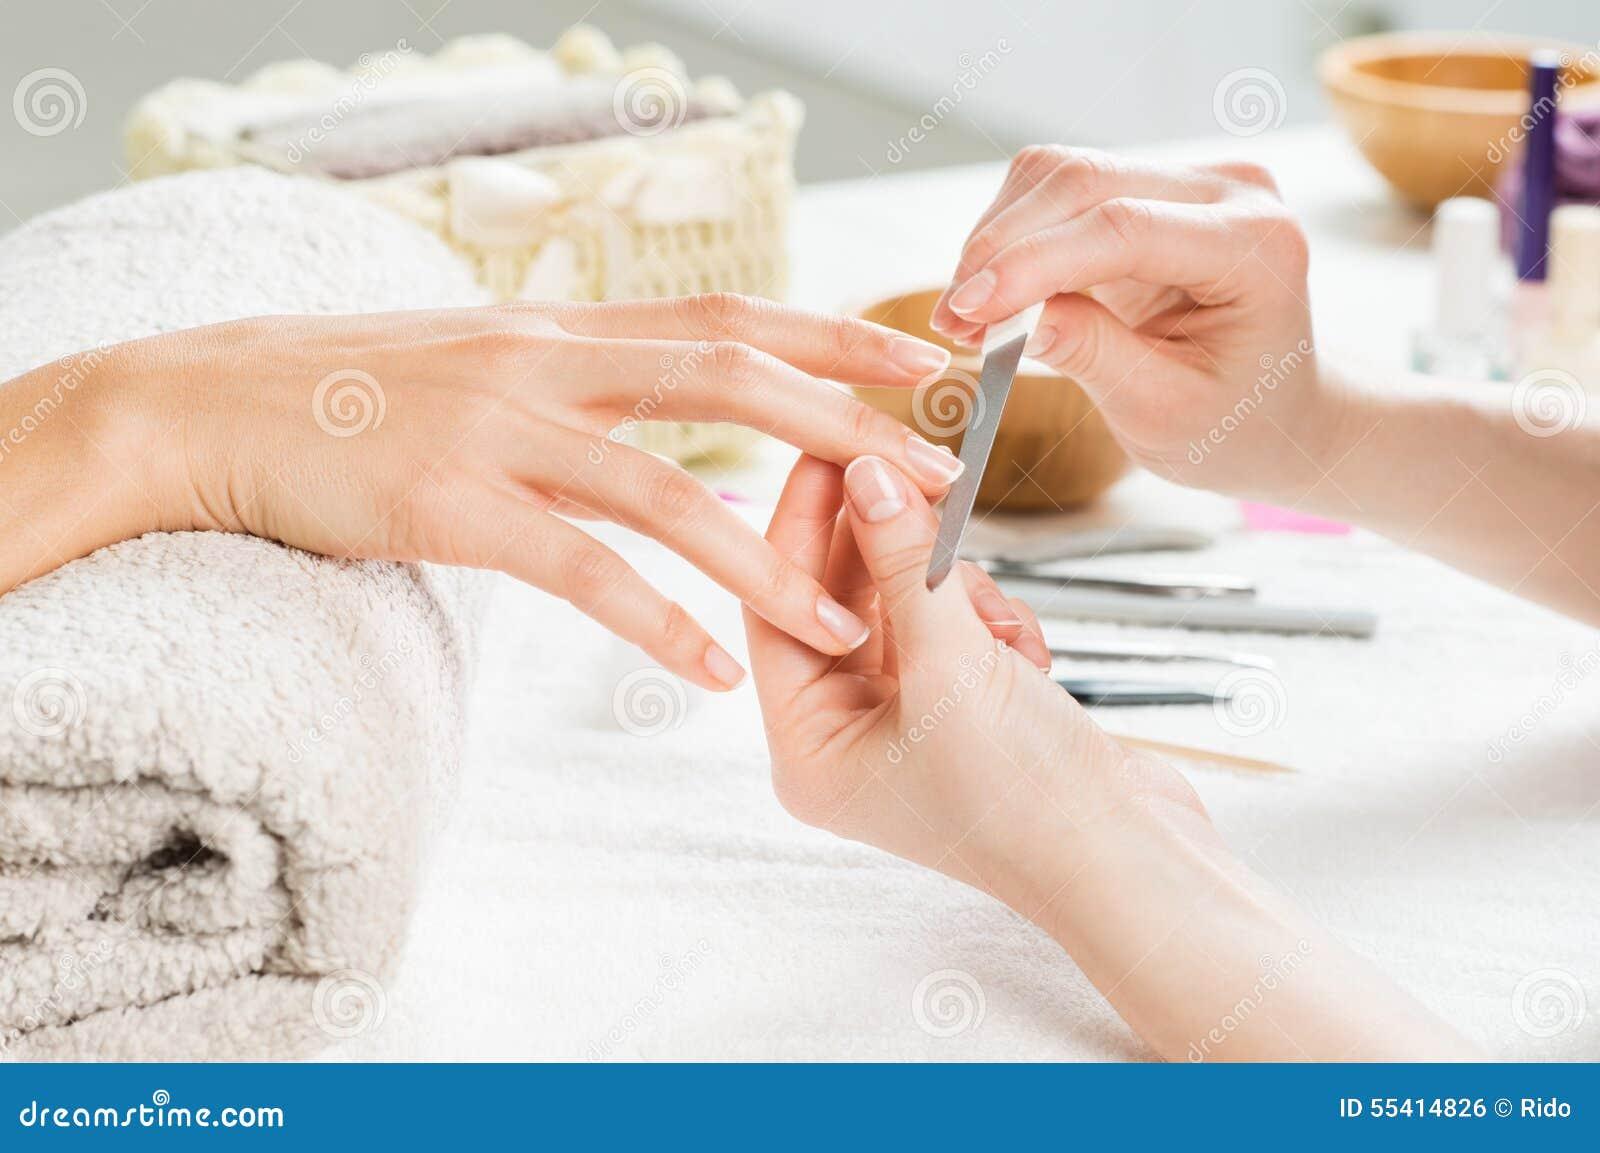 Manicure treatment at nail salon